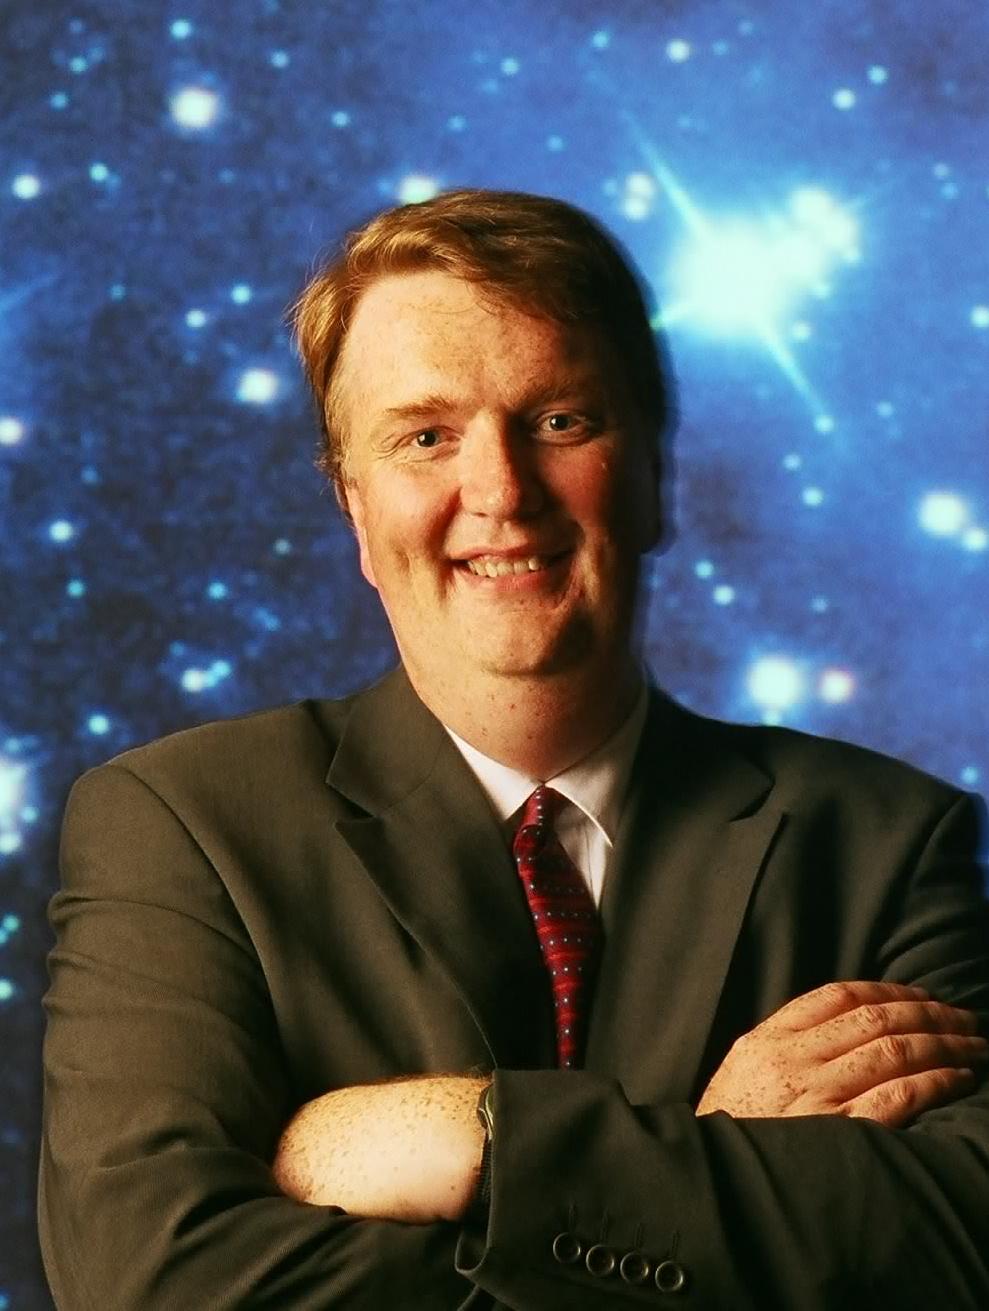 Rev. Dr. David Wilkinson